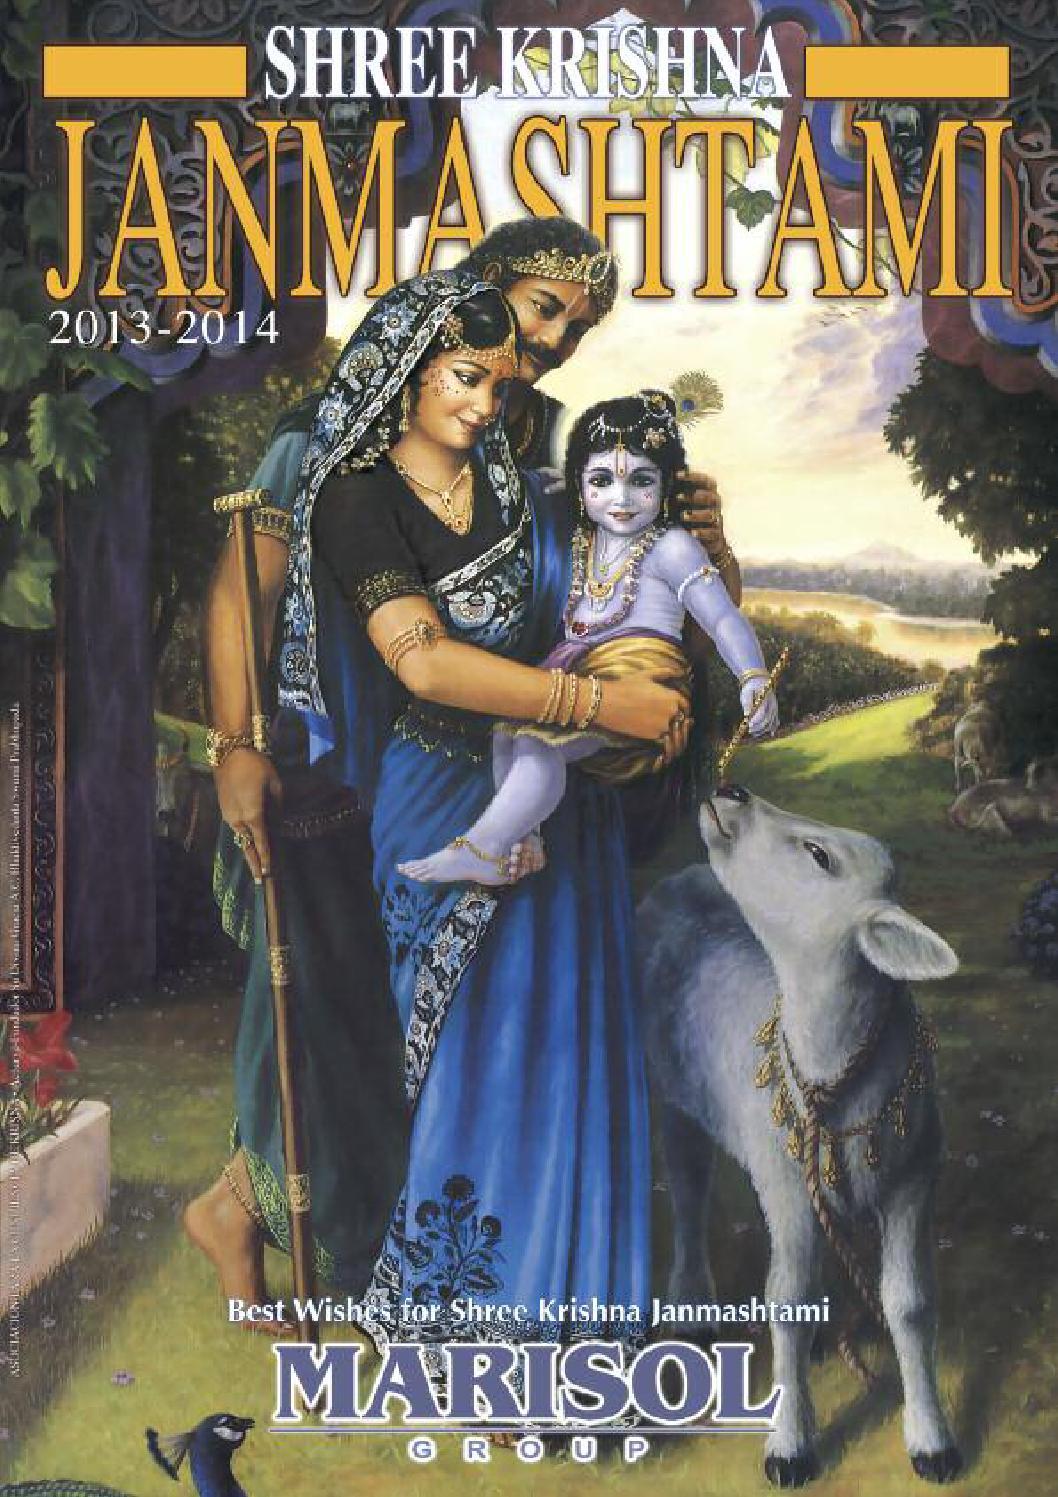 Janmashtami Directory 2013 2014 By Marc Gautam Nagpal Issuu The Little Things She Needs Malmo White Tsn0001342c2267 Putih 36